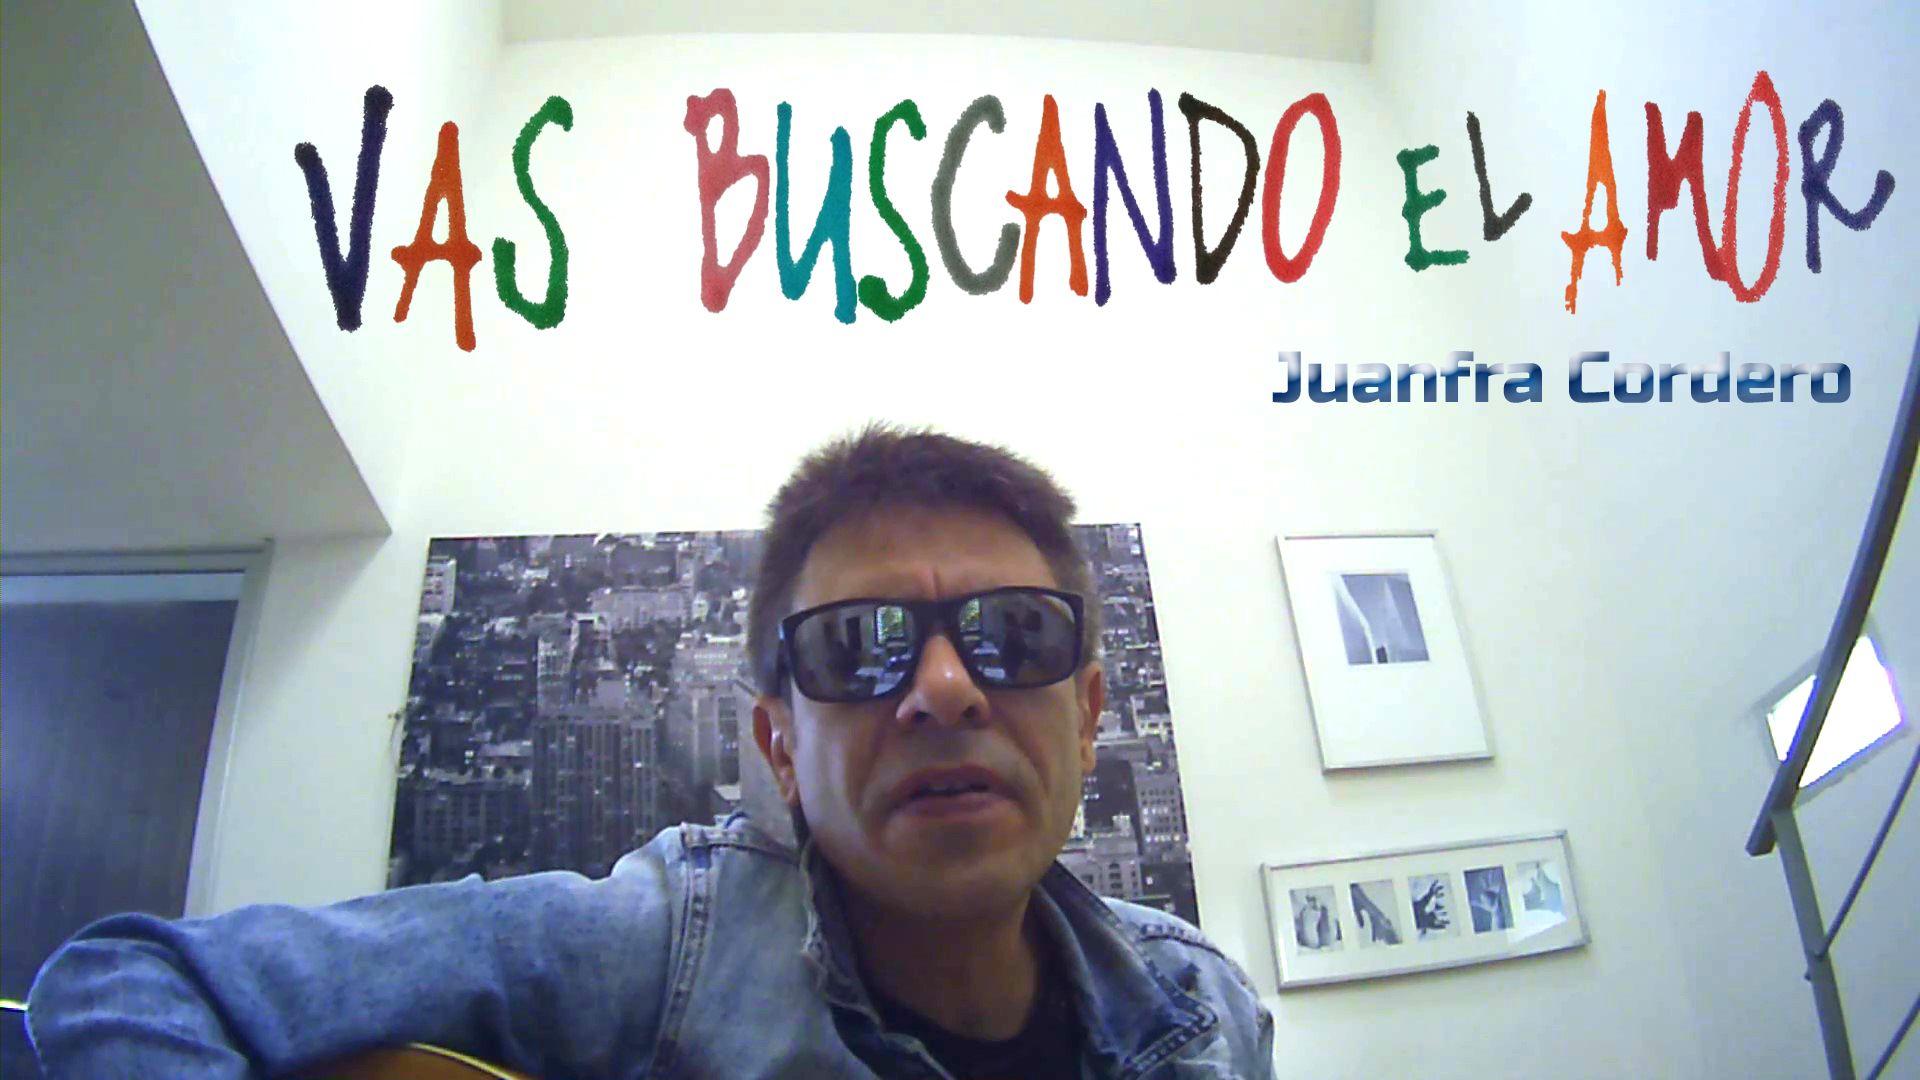 Juanfra Cordero